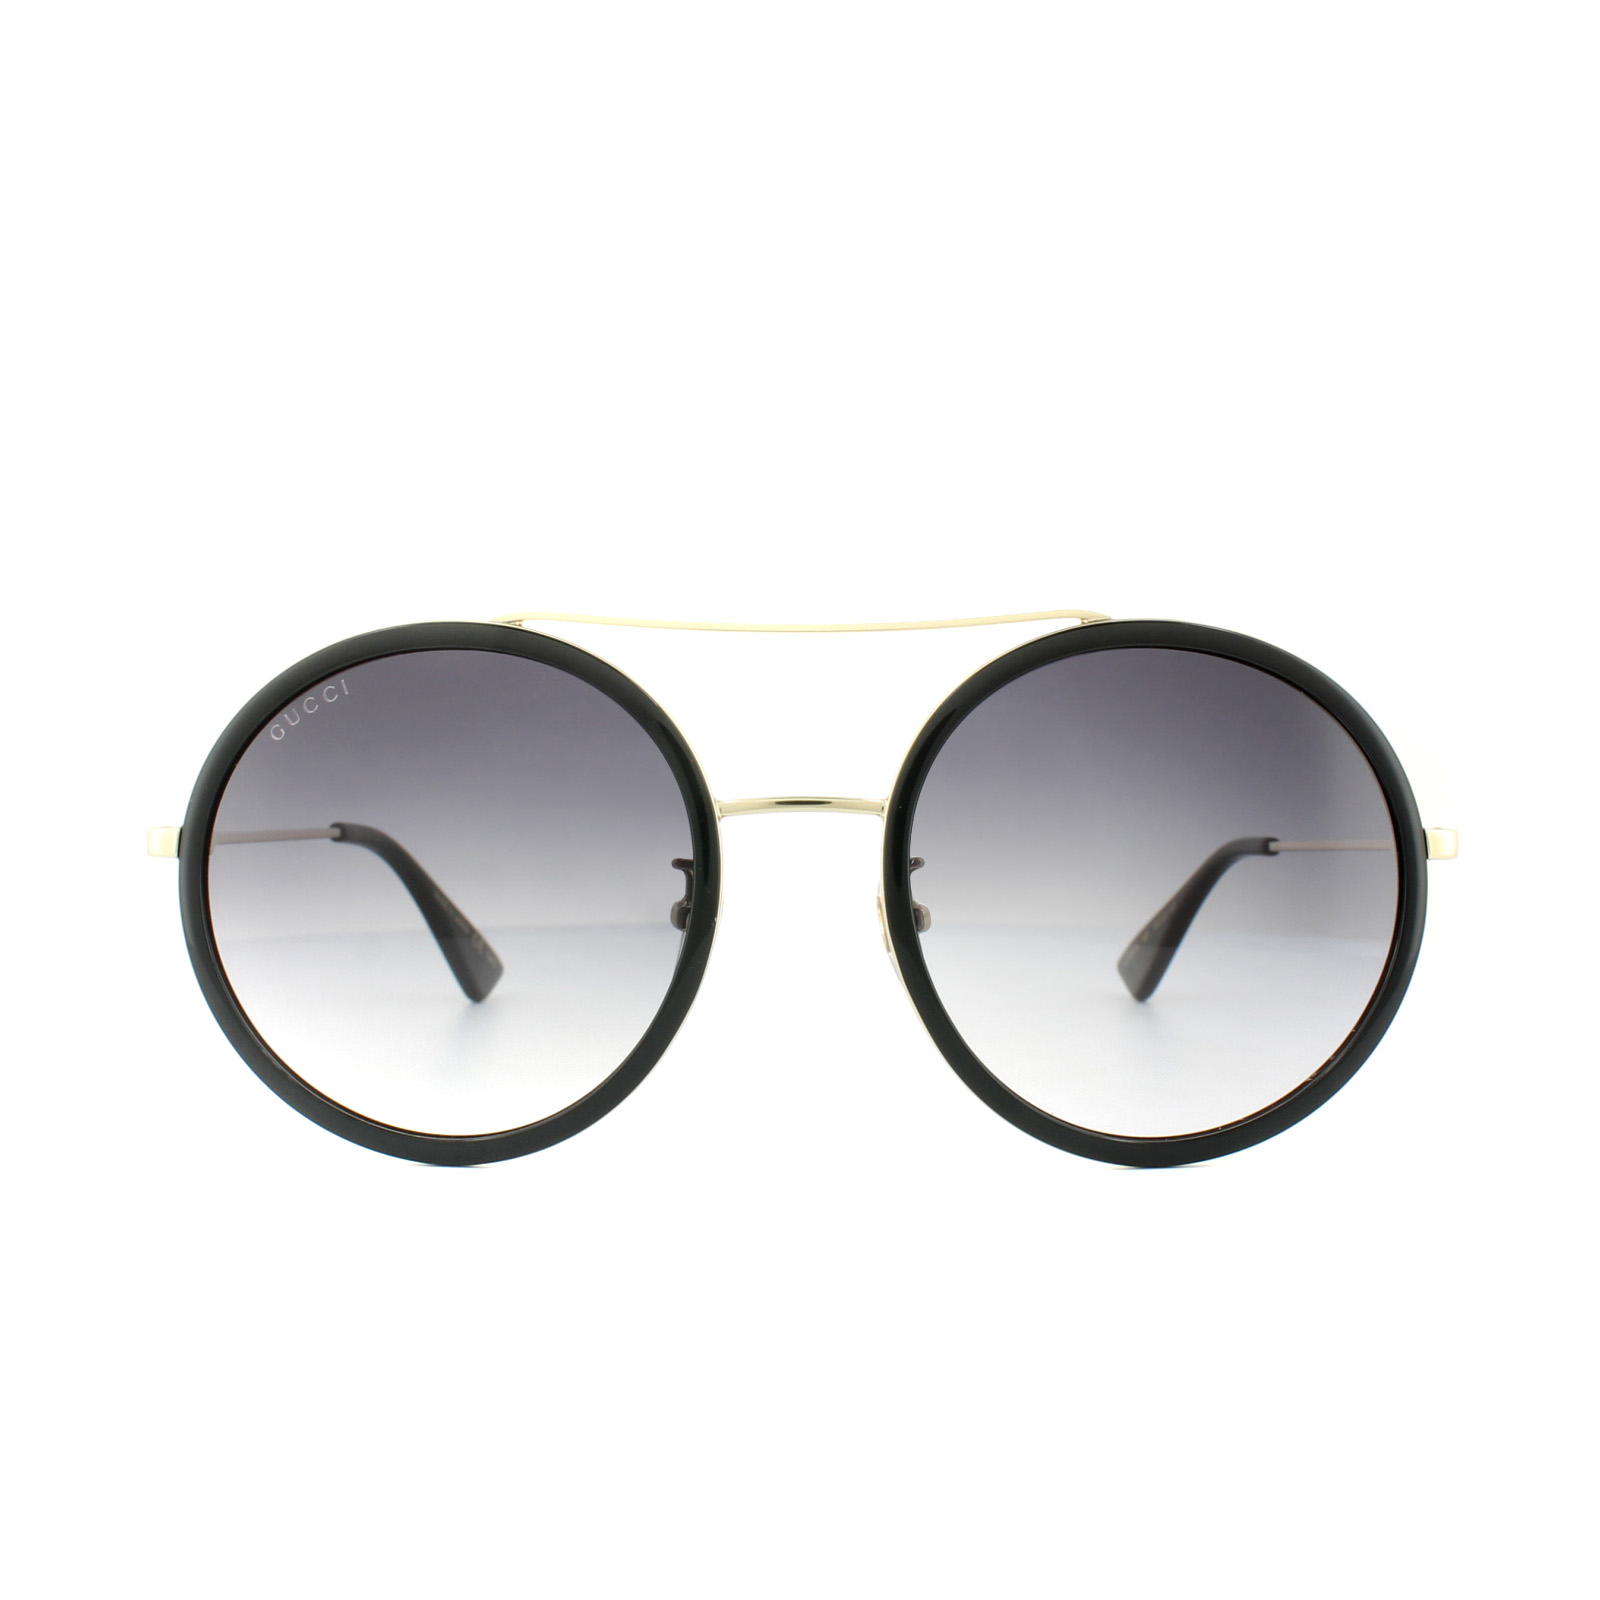 03b931bce4 Gucci Sunglasses GG0061S 001 Black Gold Grey Gradient 889652051208 ...